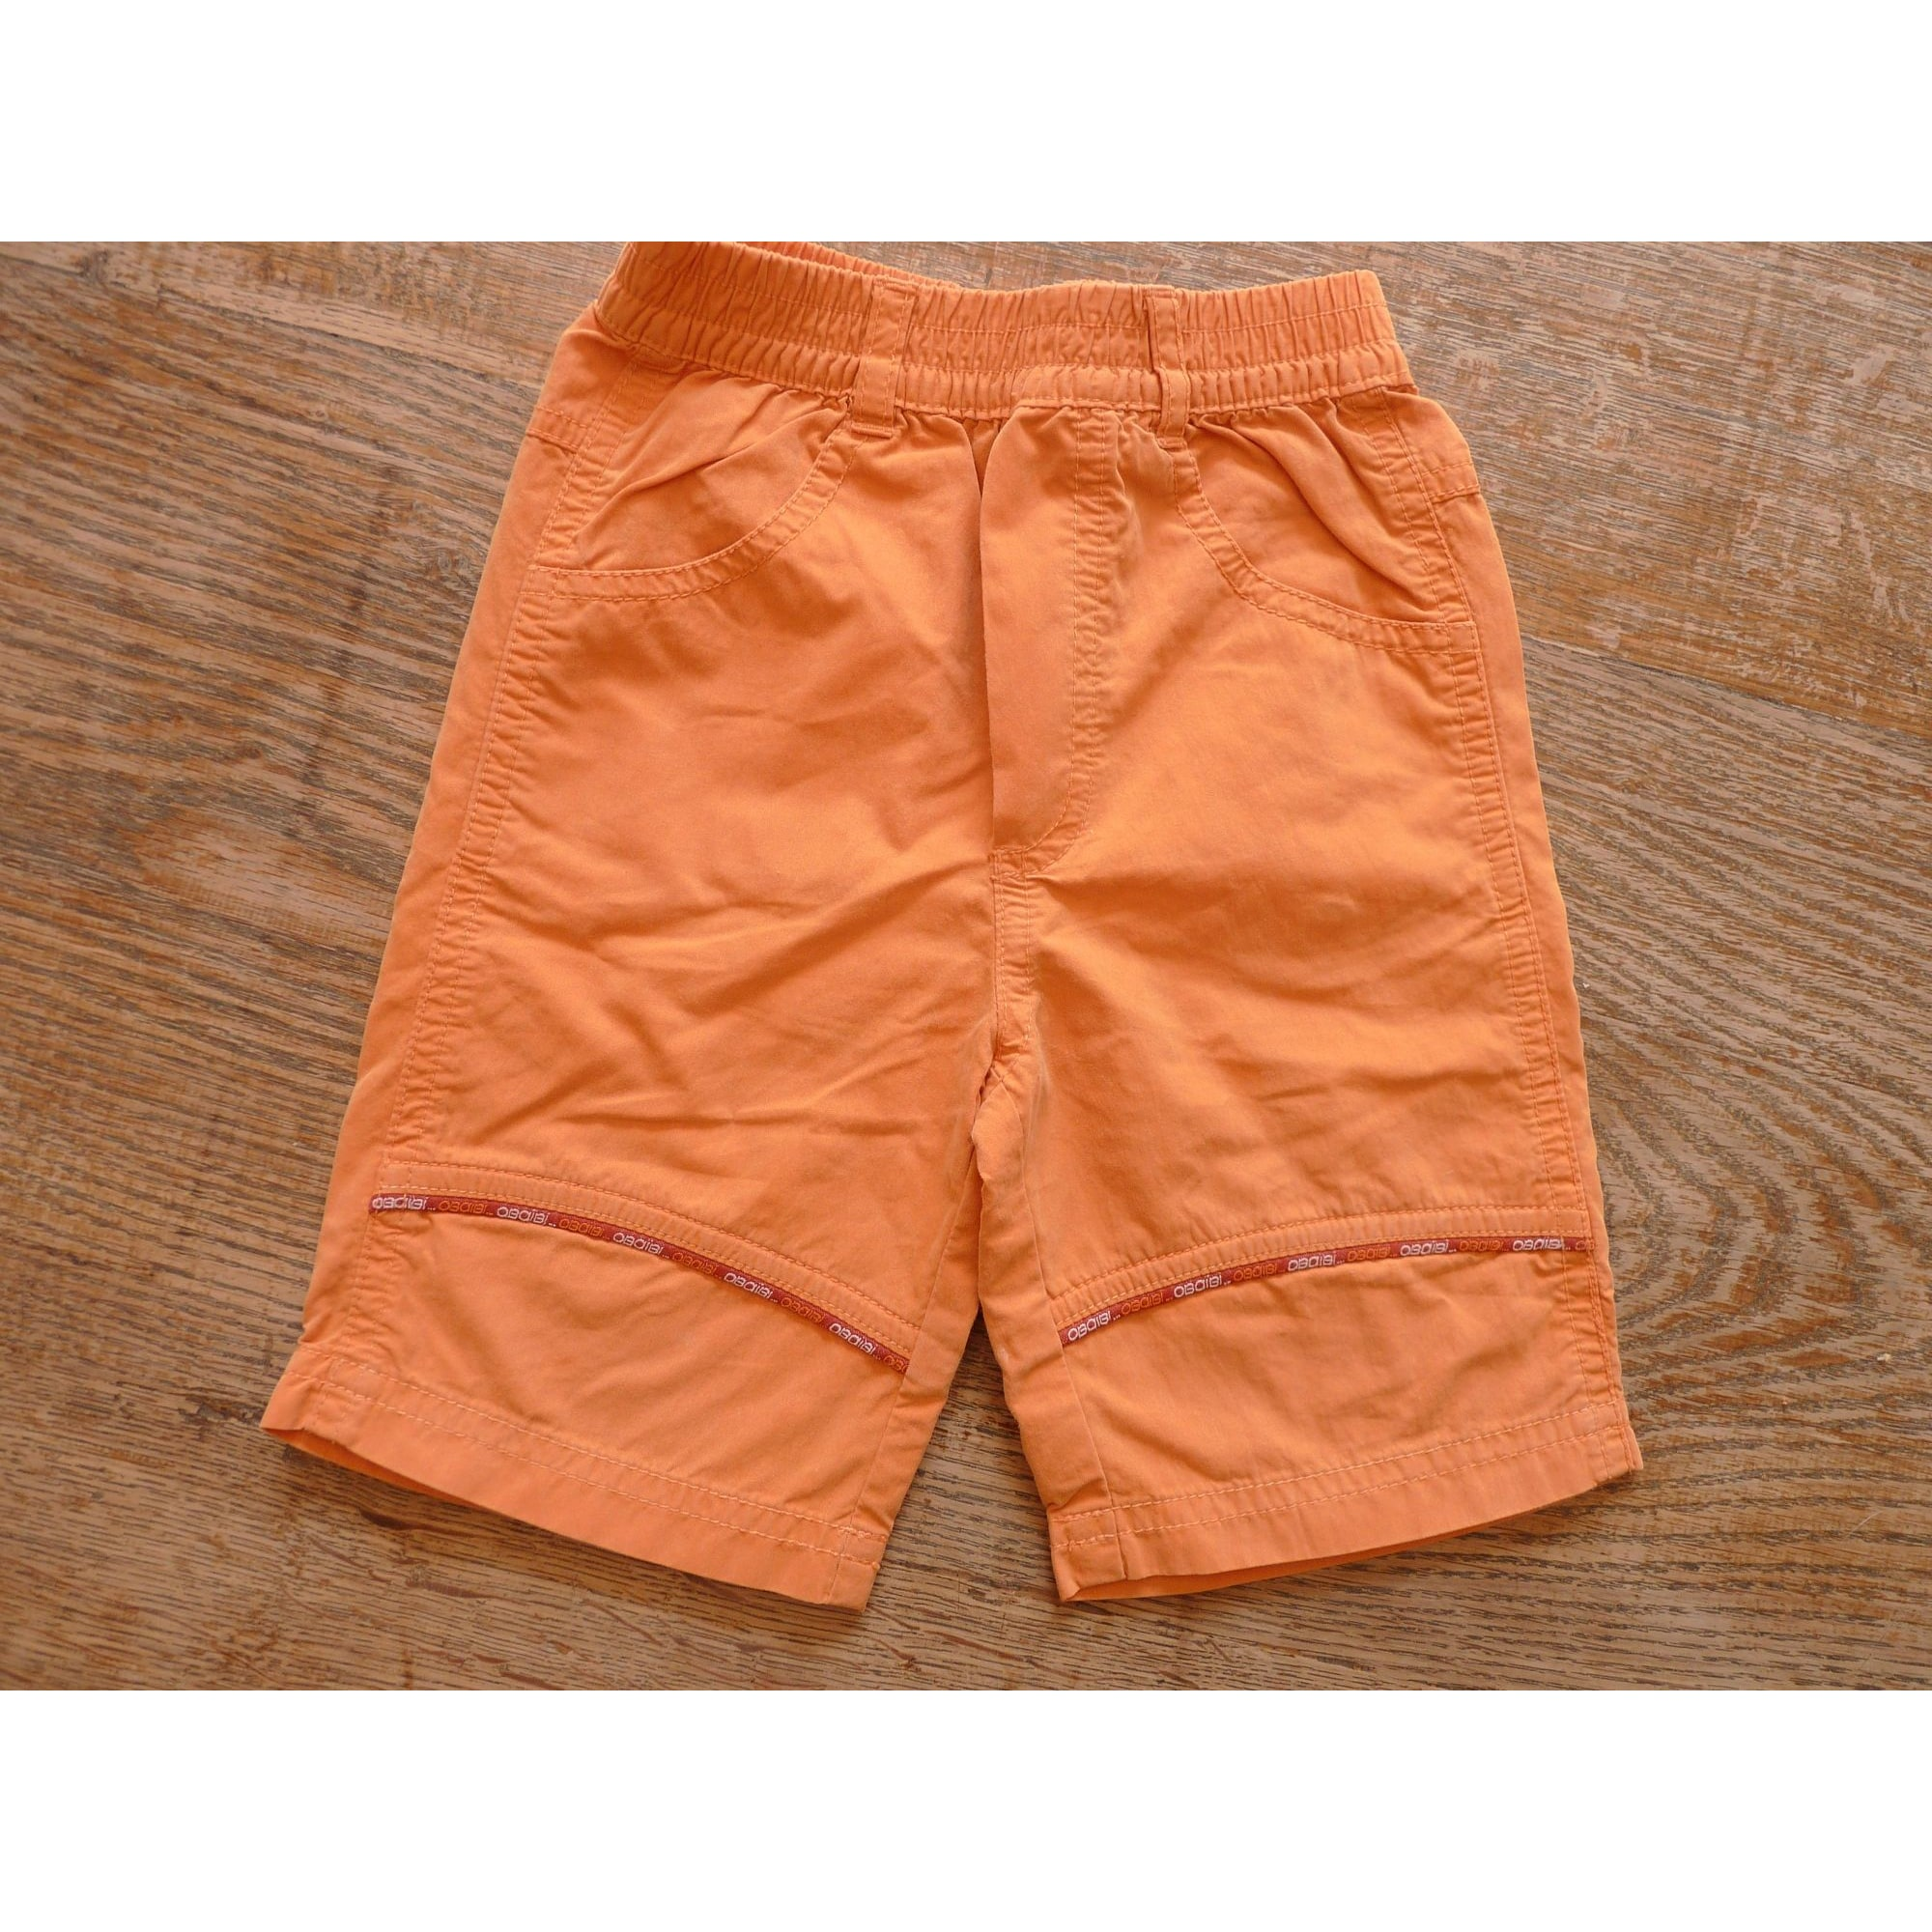 Bermuda Shorts OBAIBI Orange